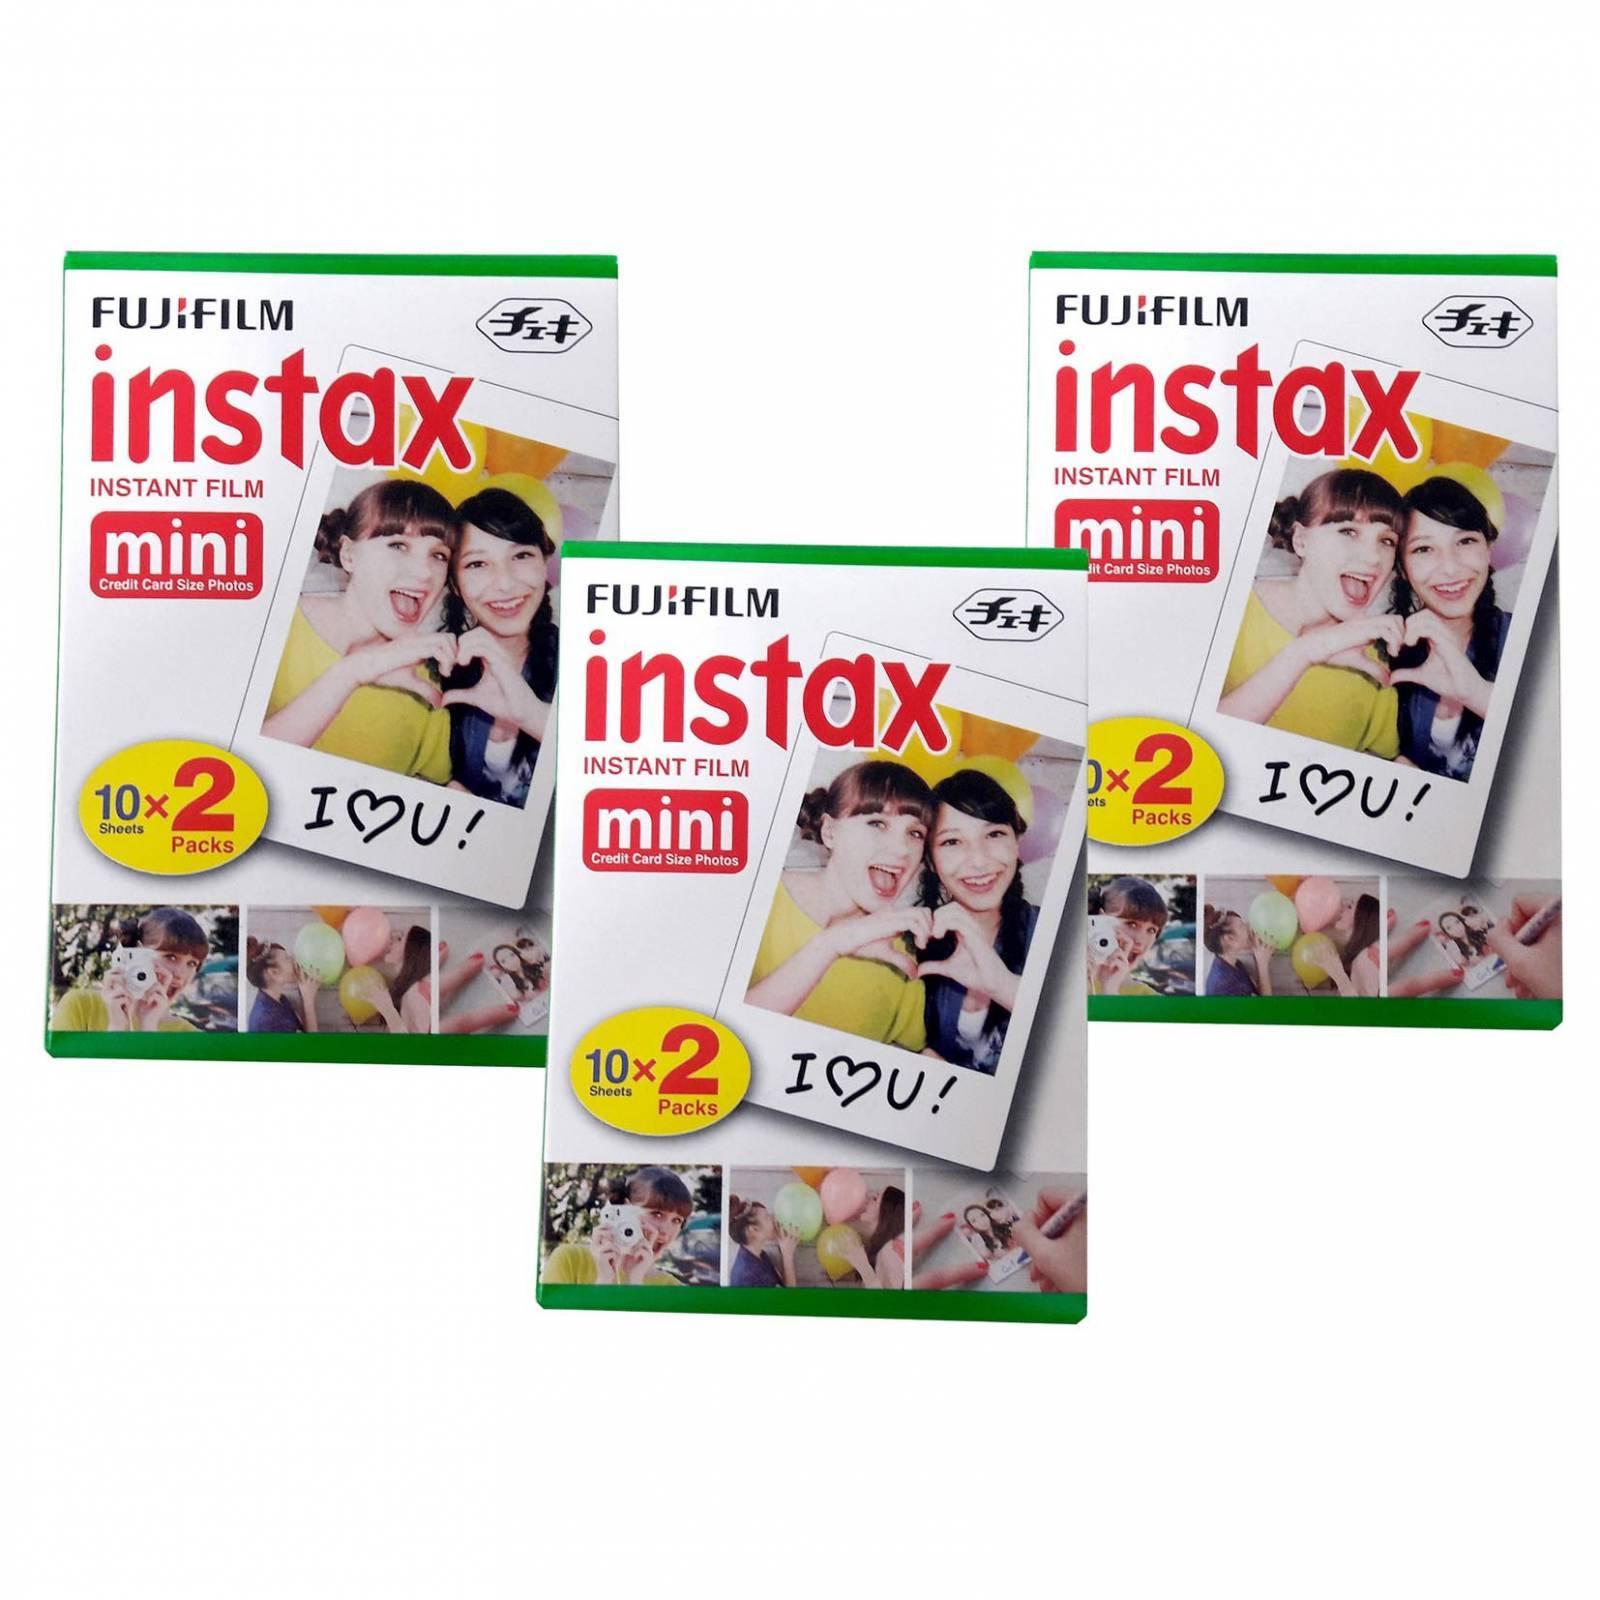 combo_03_Filmes: FujiFilm Instax Mini - R$ 76_CADA